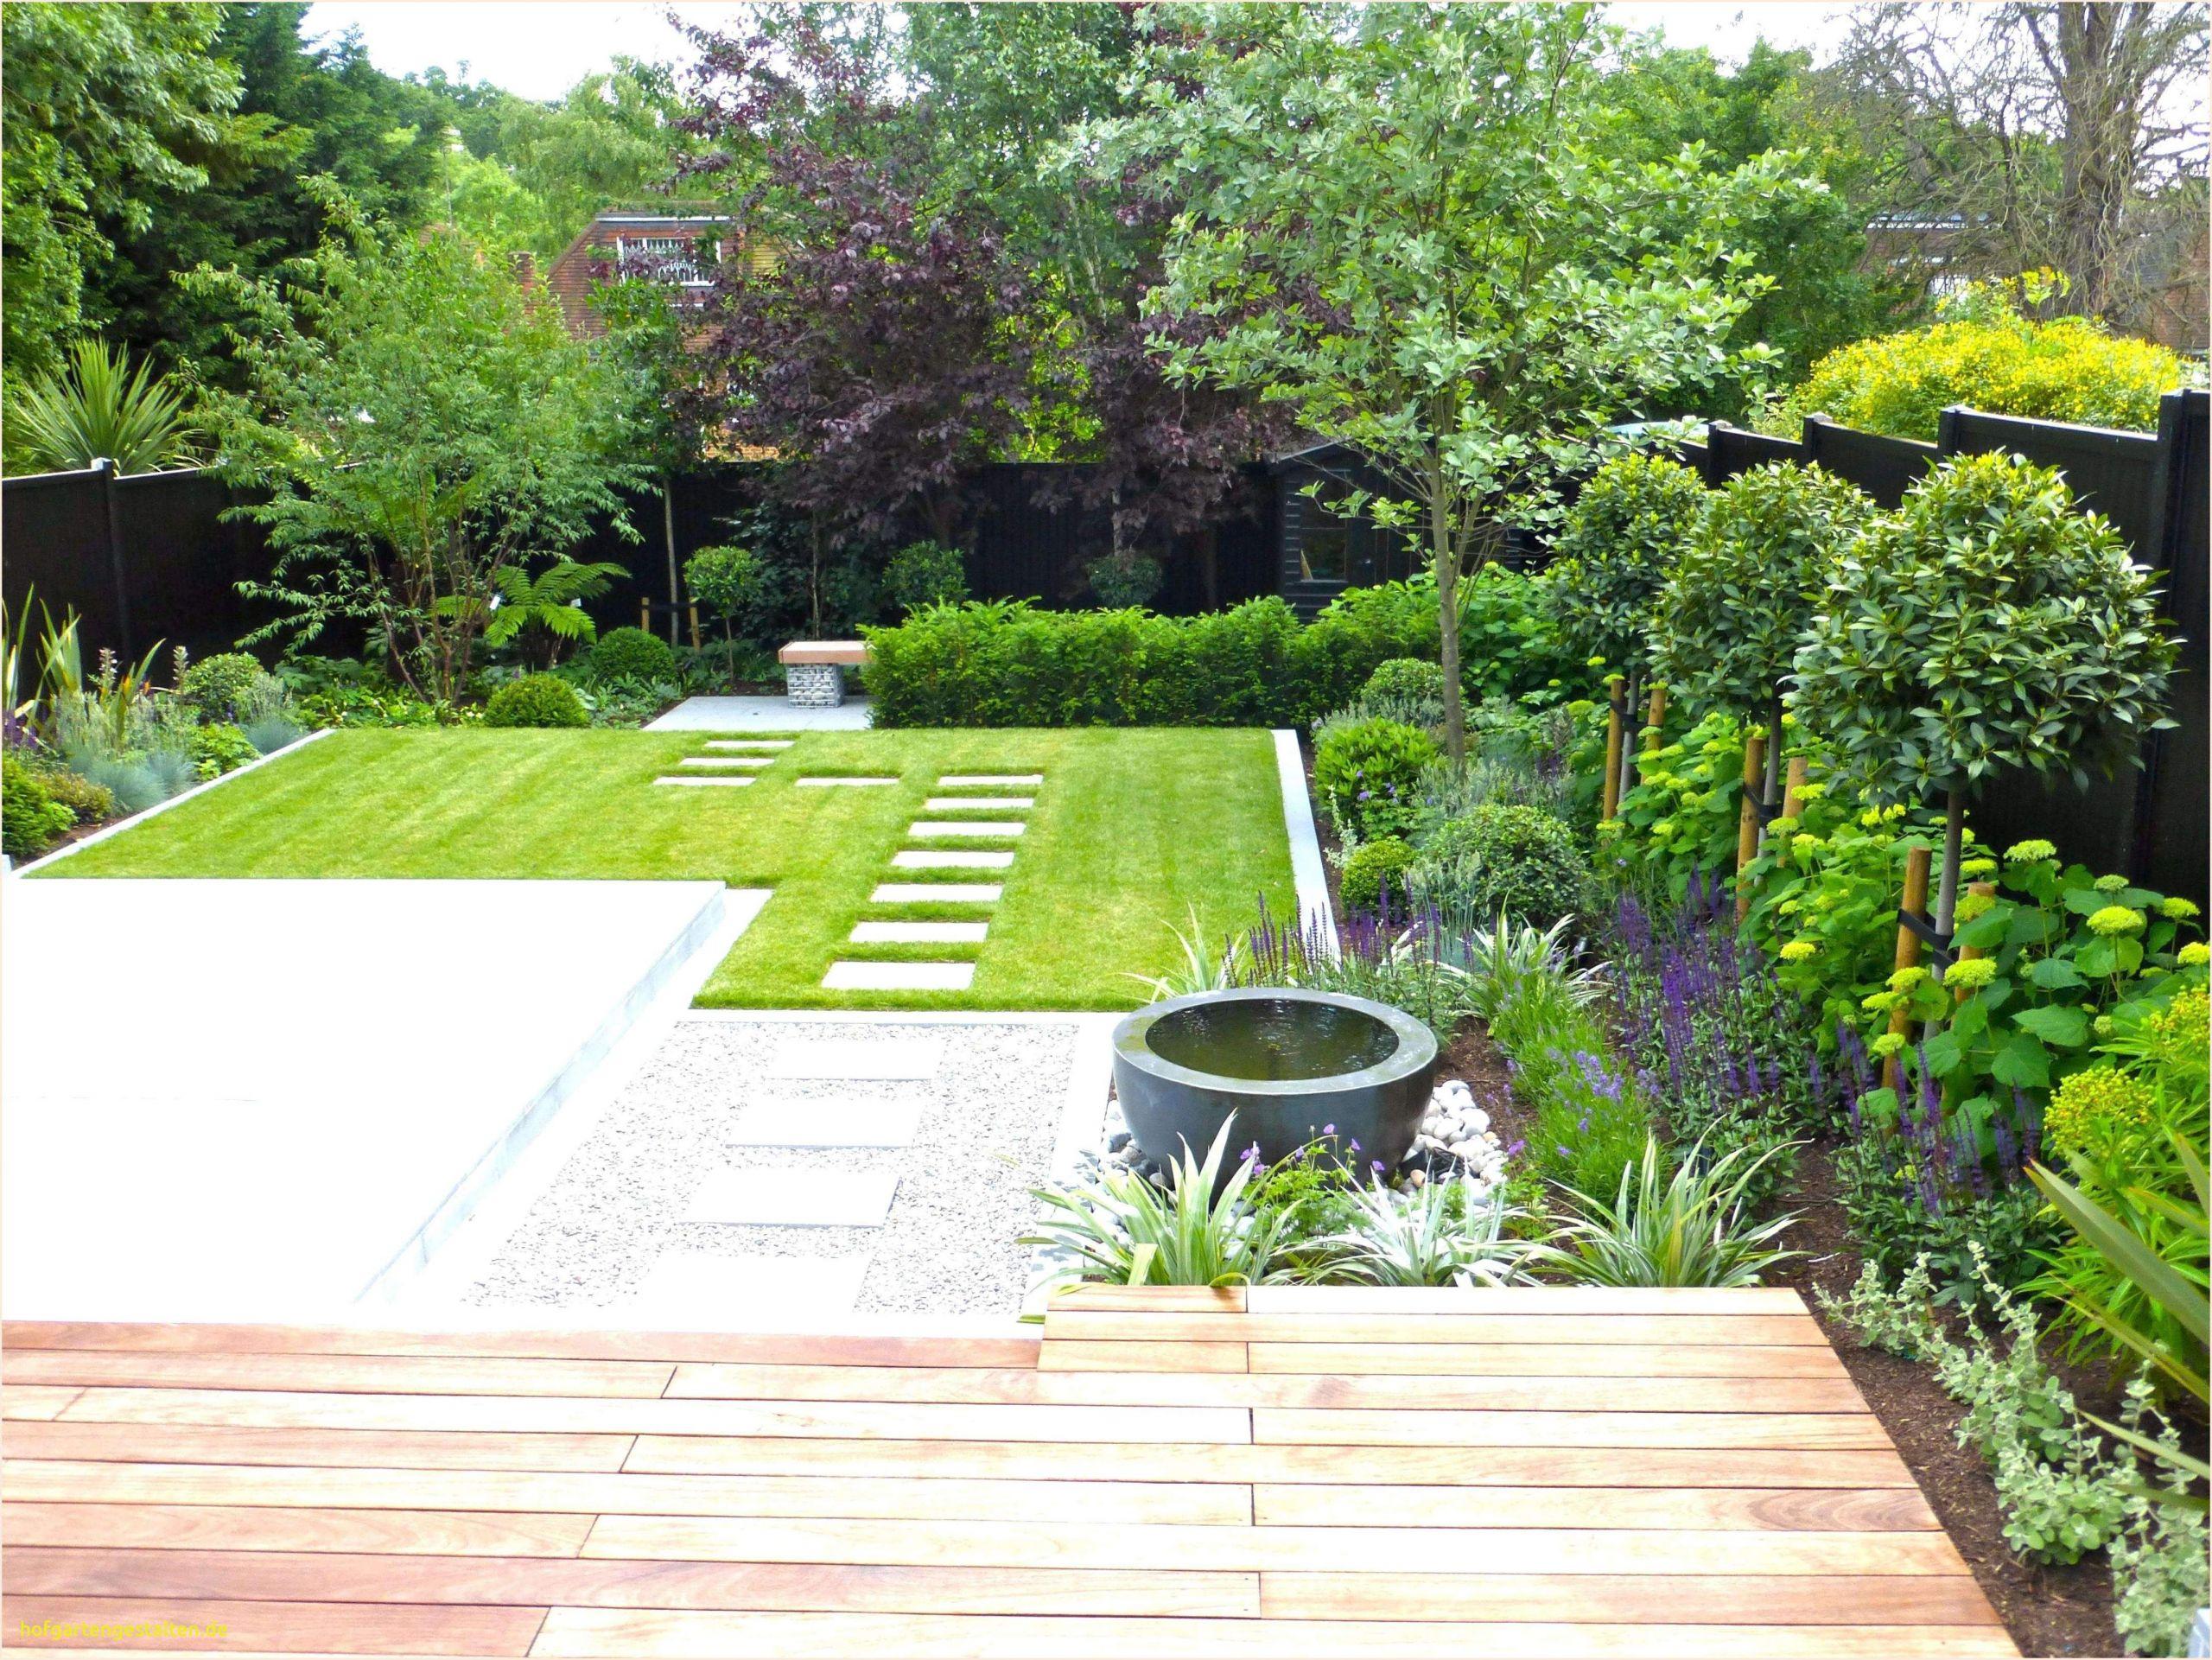 Garten Zu Verschenken Elegant Deko Ideen Selber Machen Garten — Temobardz Home Blog